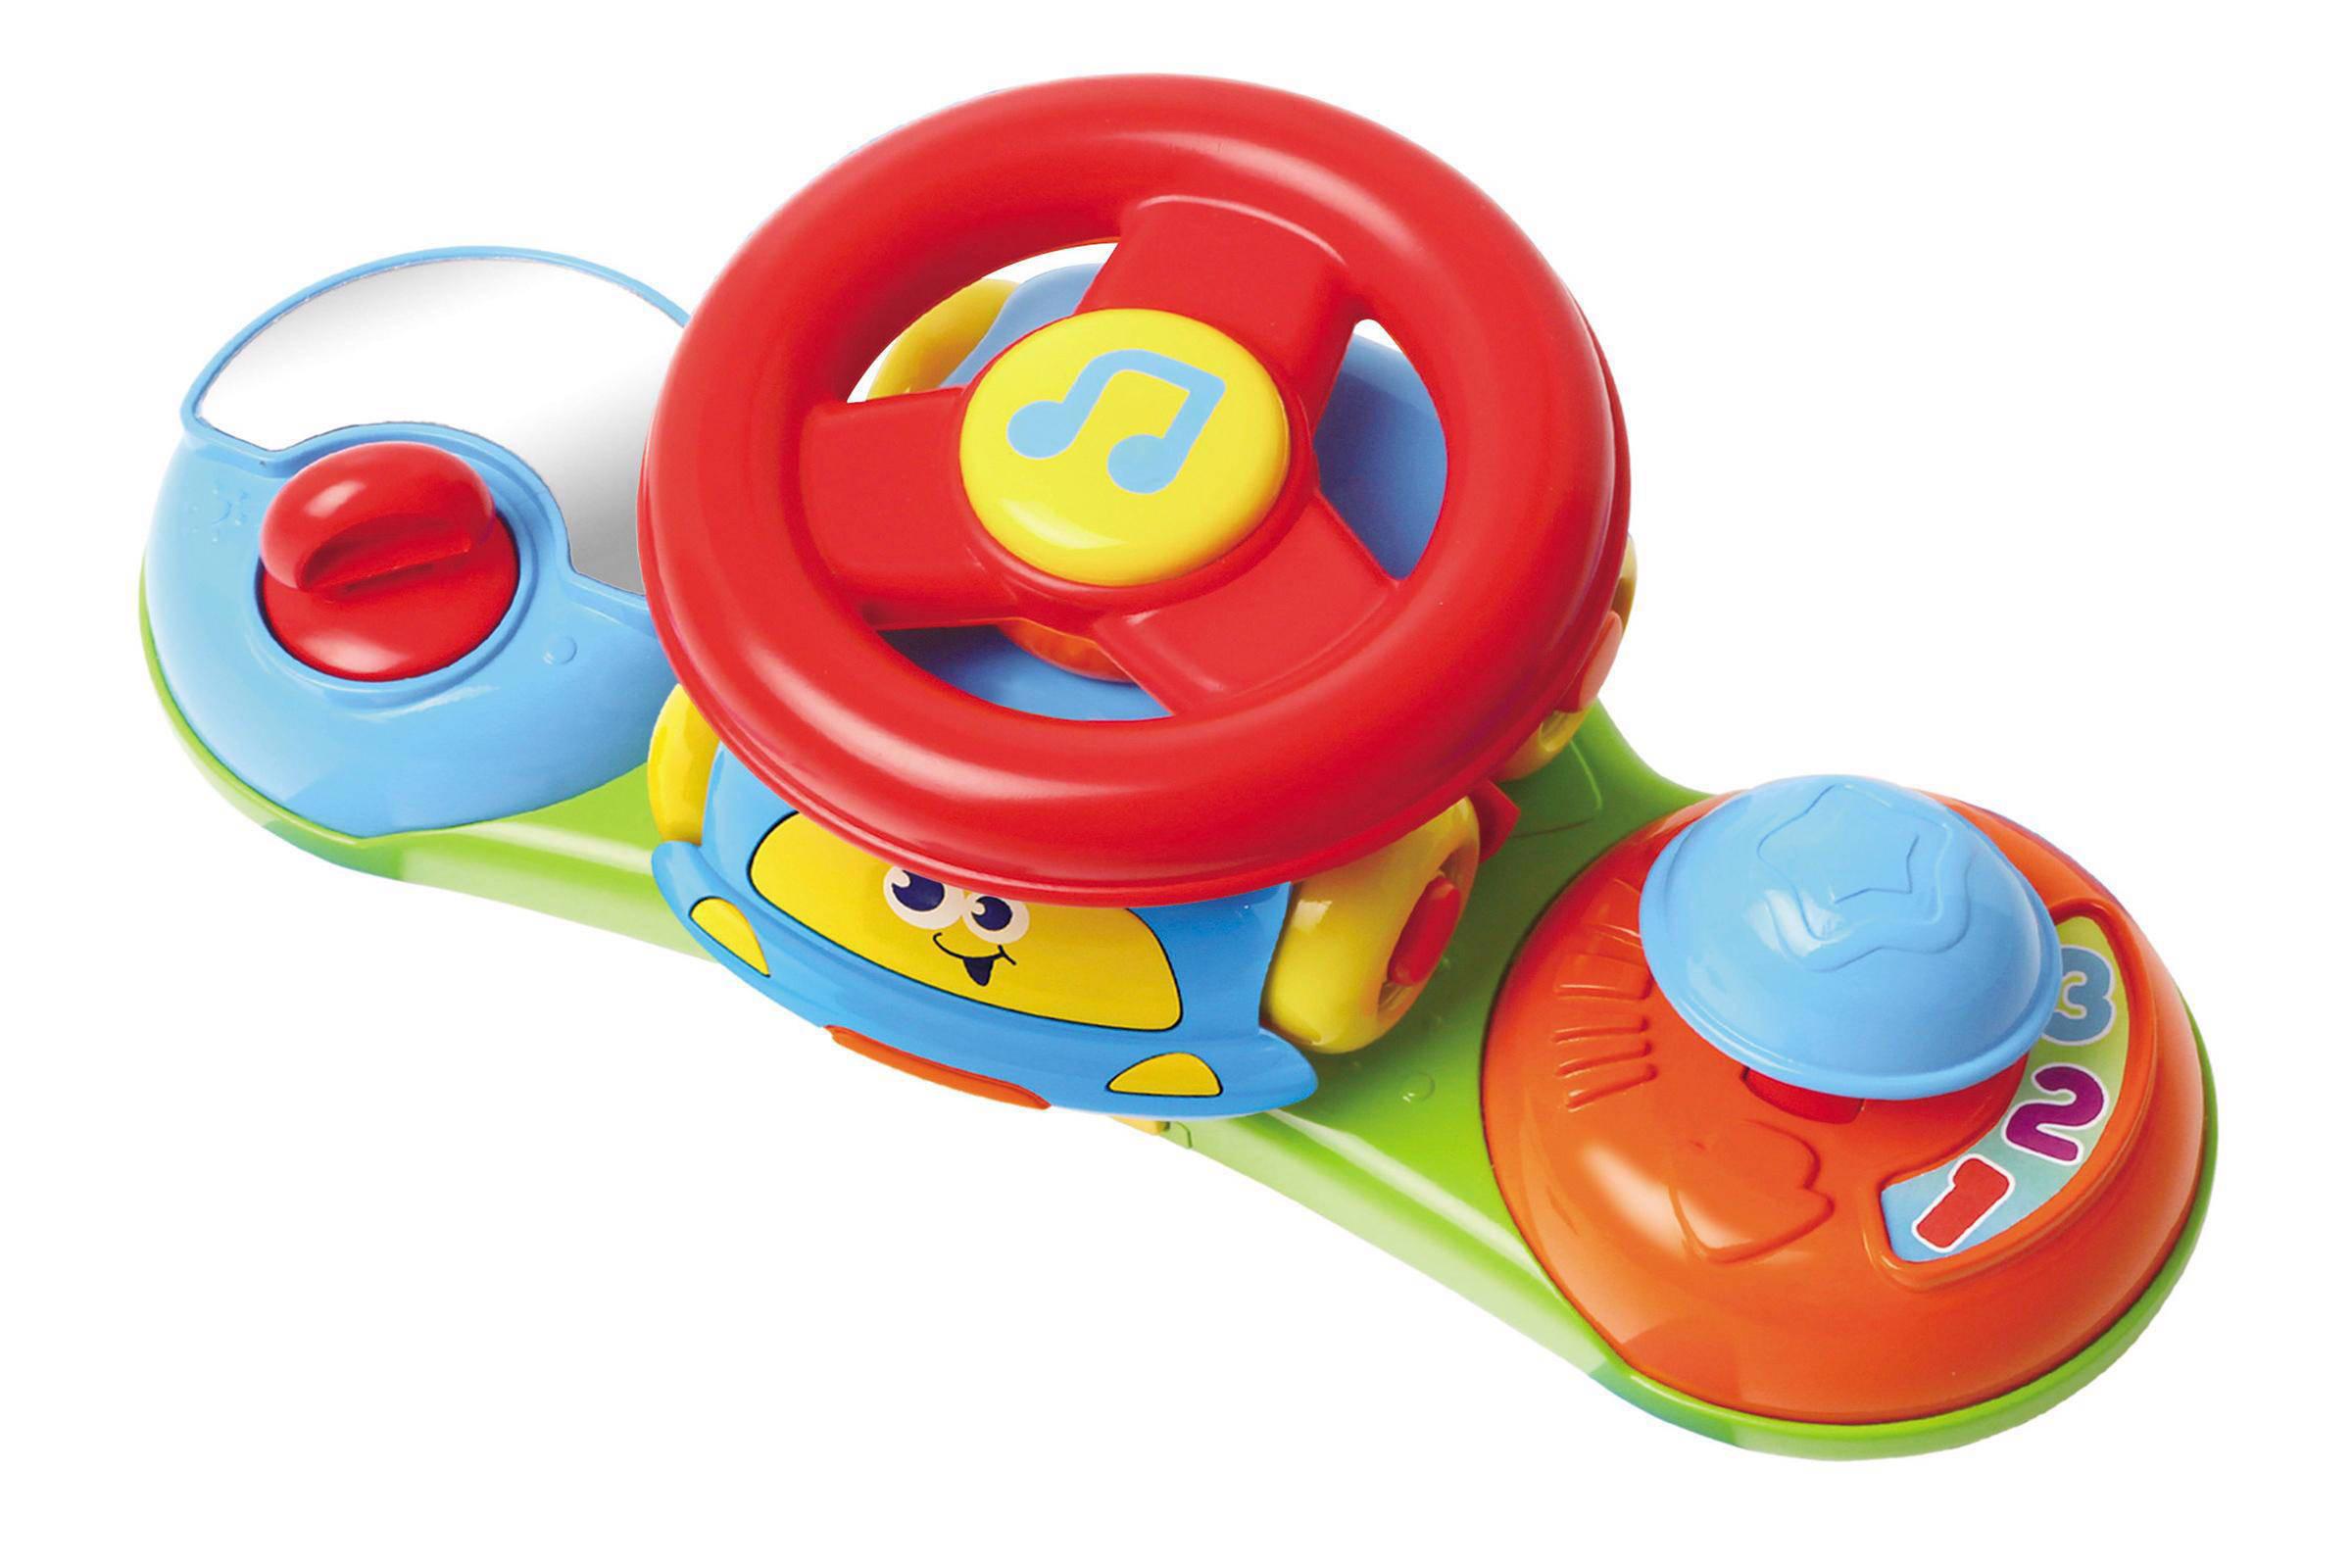 Infantino baby stuur | wehkamp